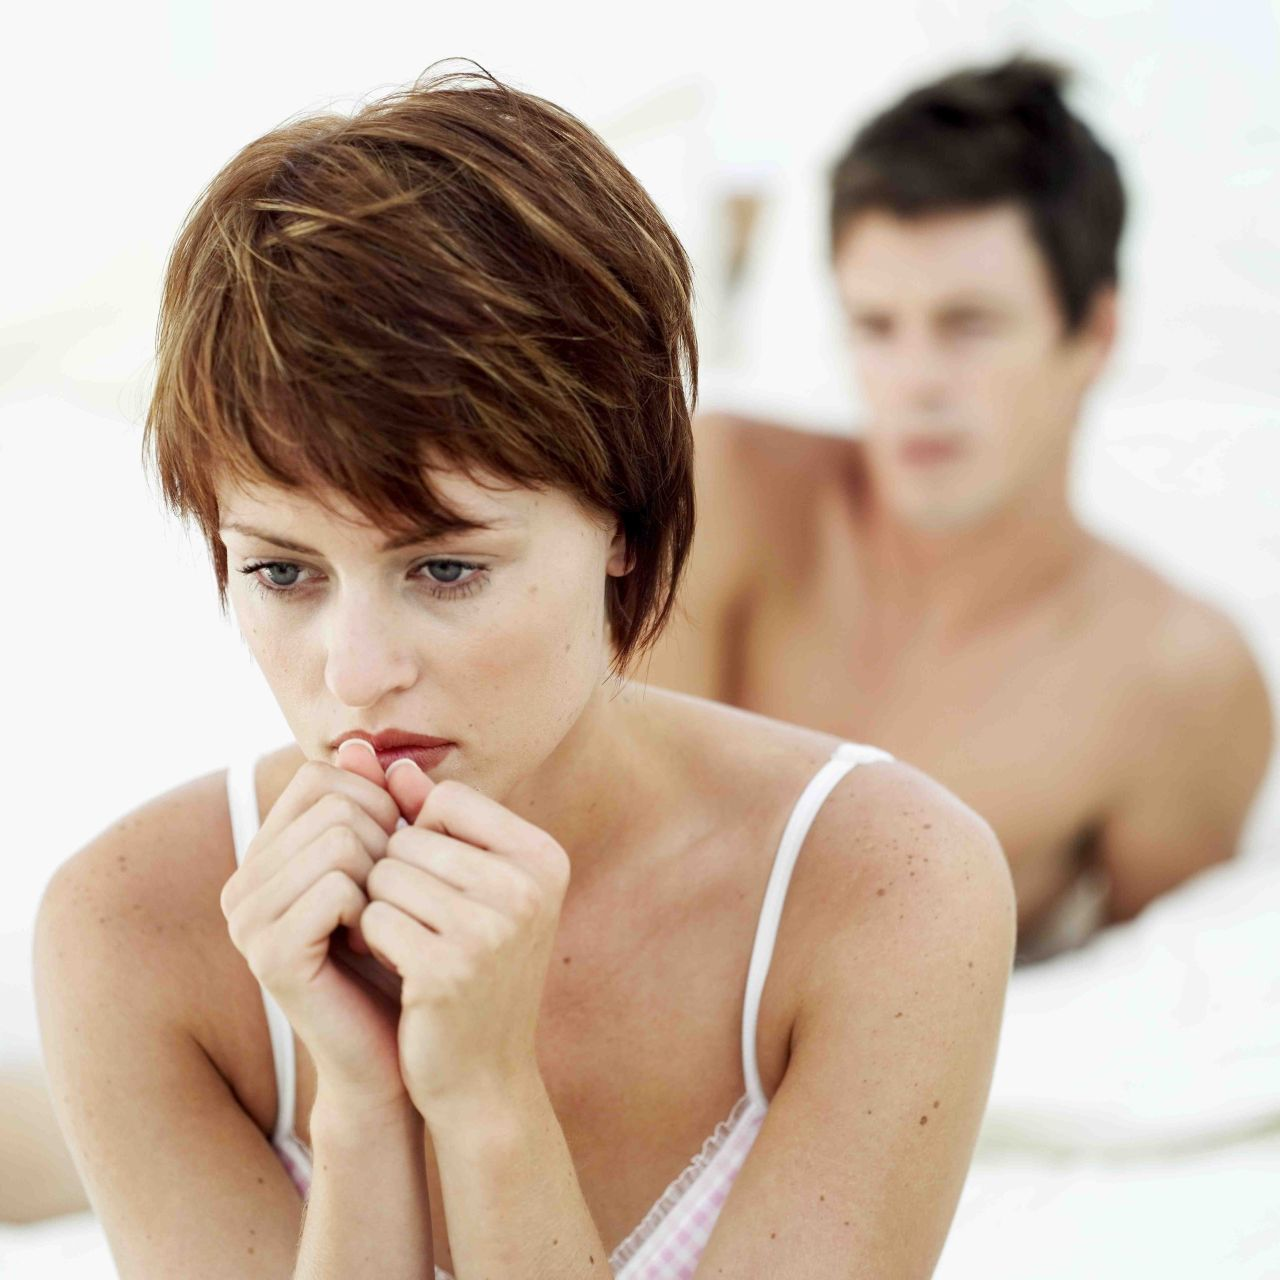 kontratseptivi-posle-seksa